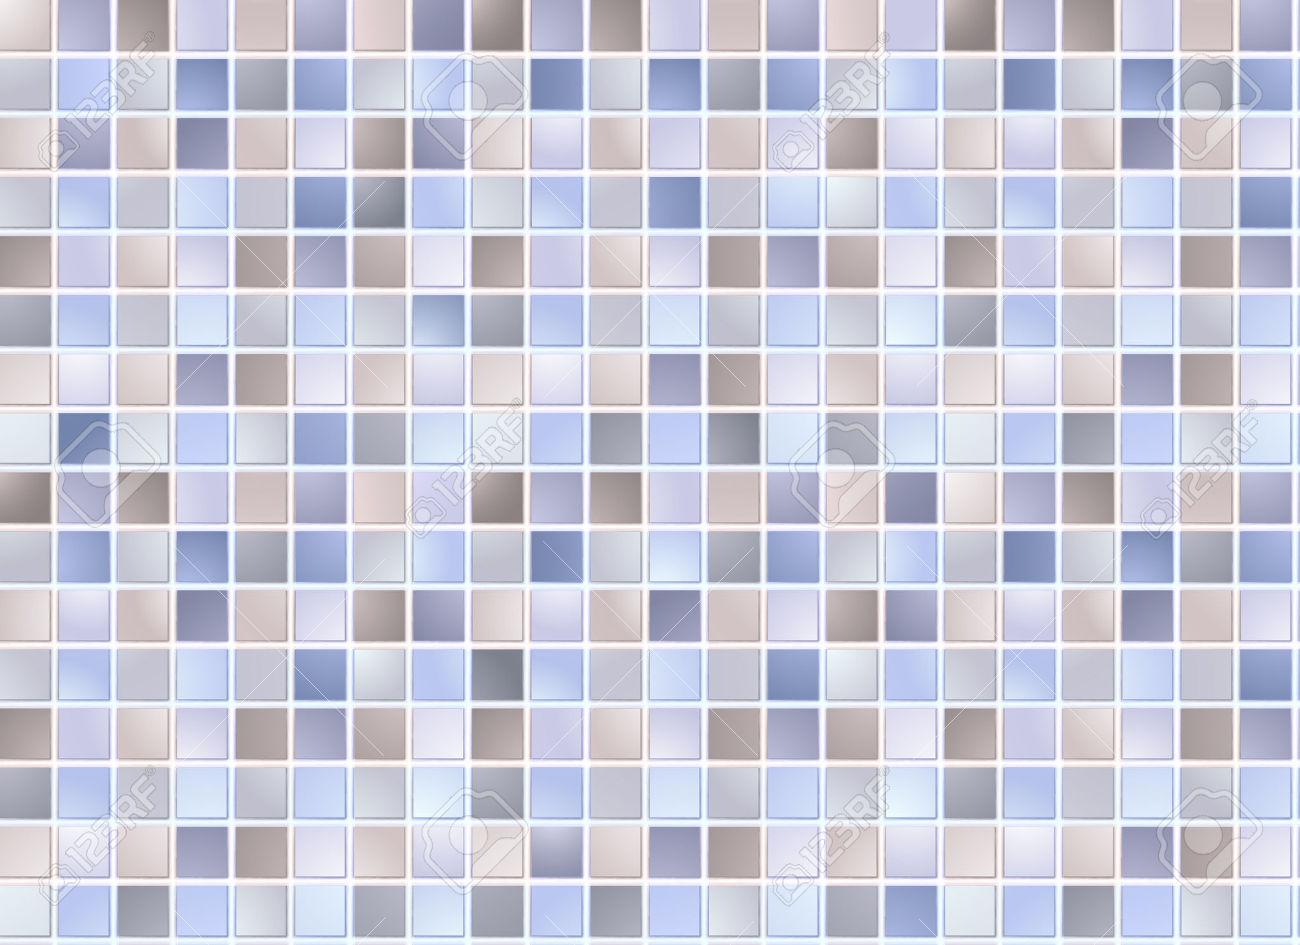 Stock Image Texture Background Bathroom Swimming Pool Tiles.